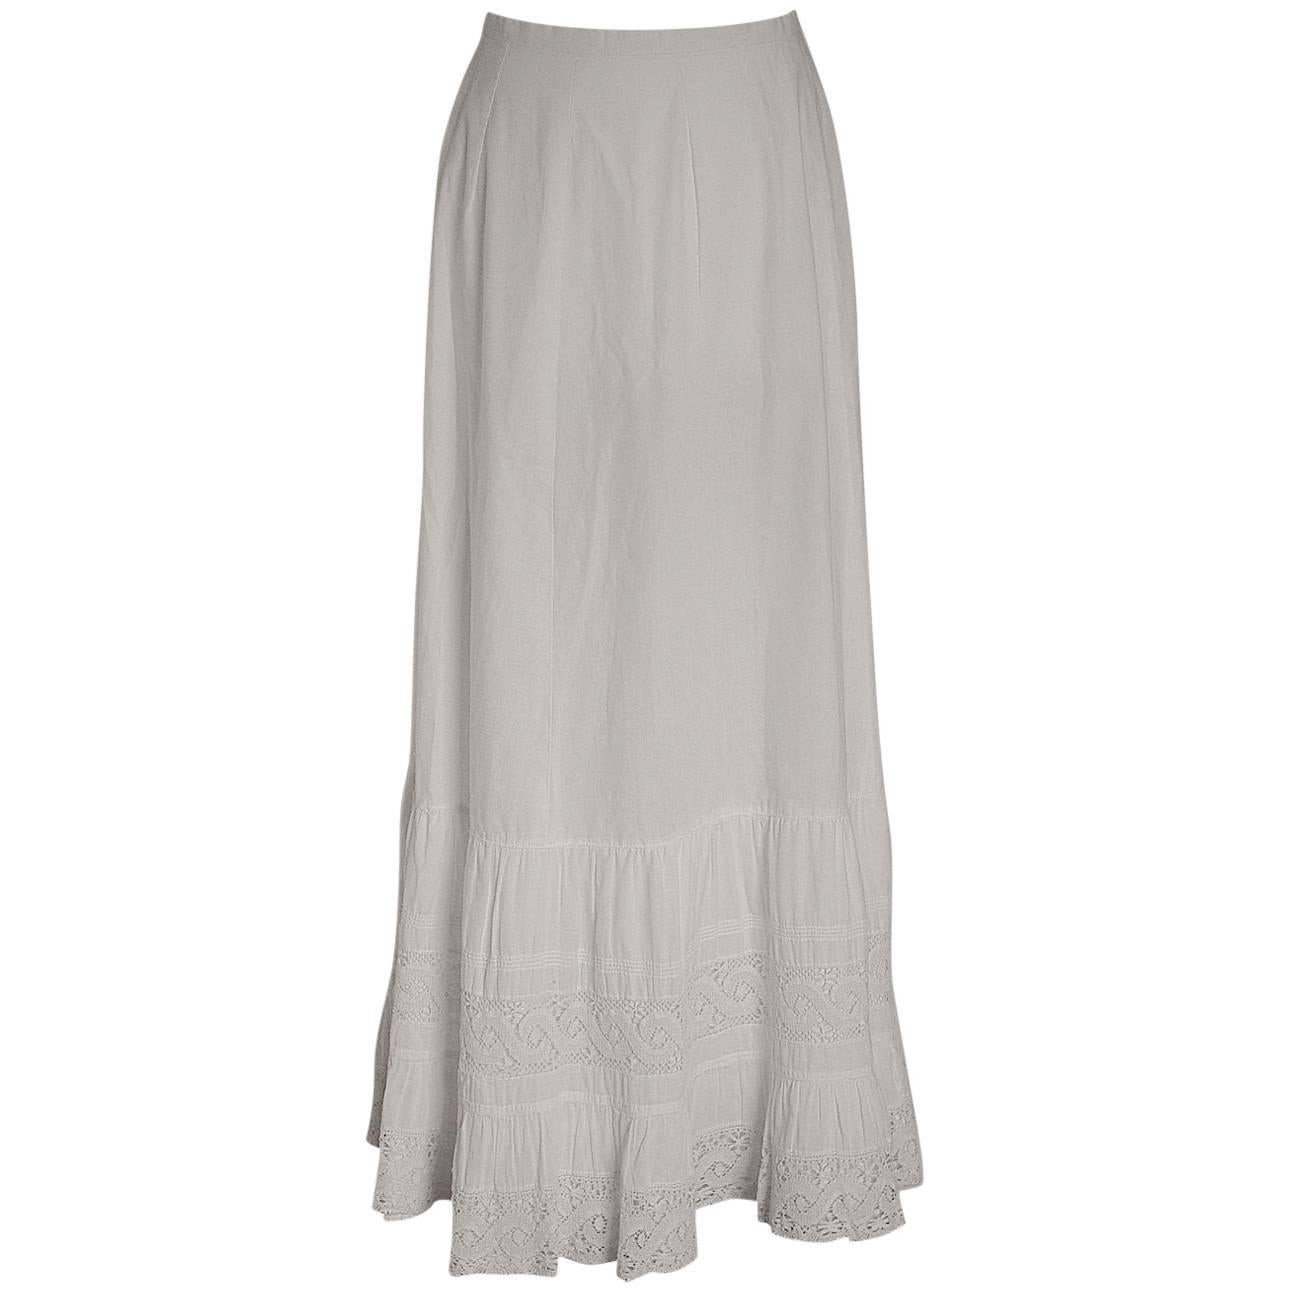 Antique Edwardian White Cotton and Lace Petticoat circa 1900s